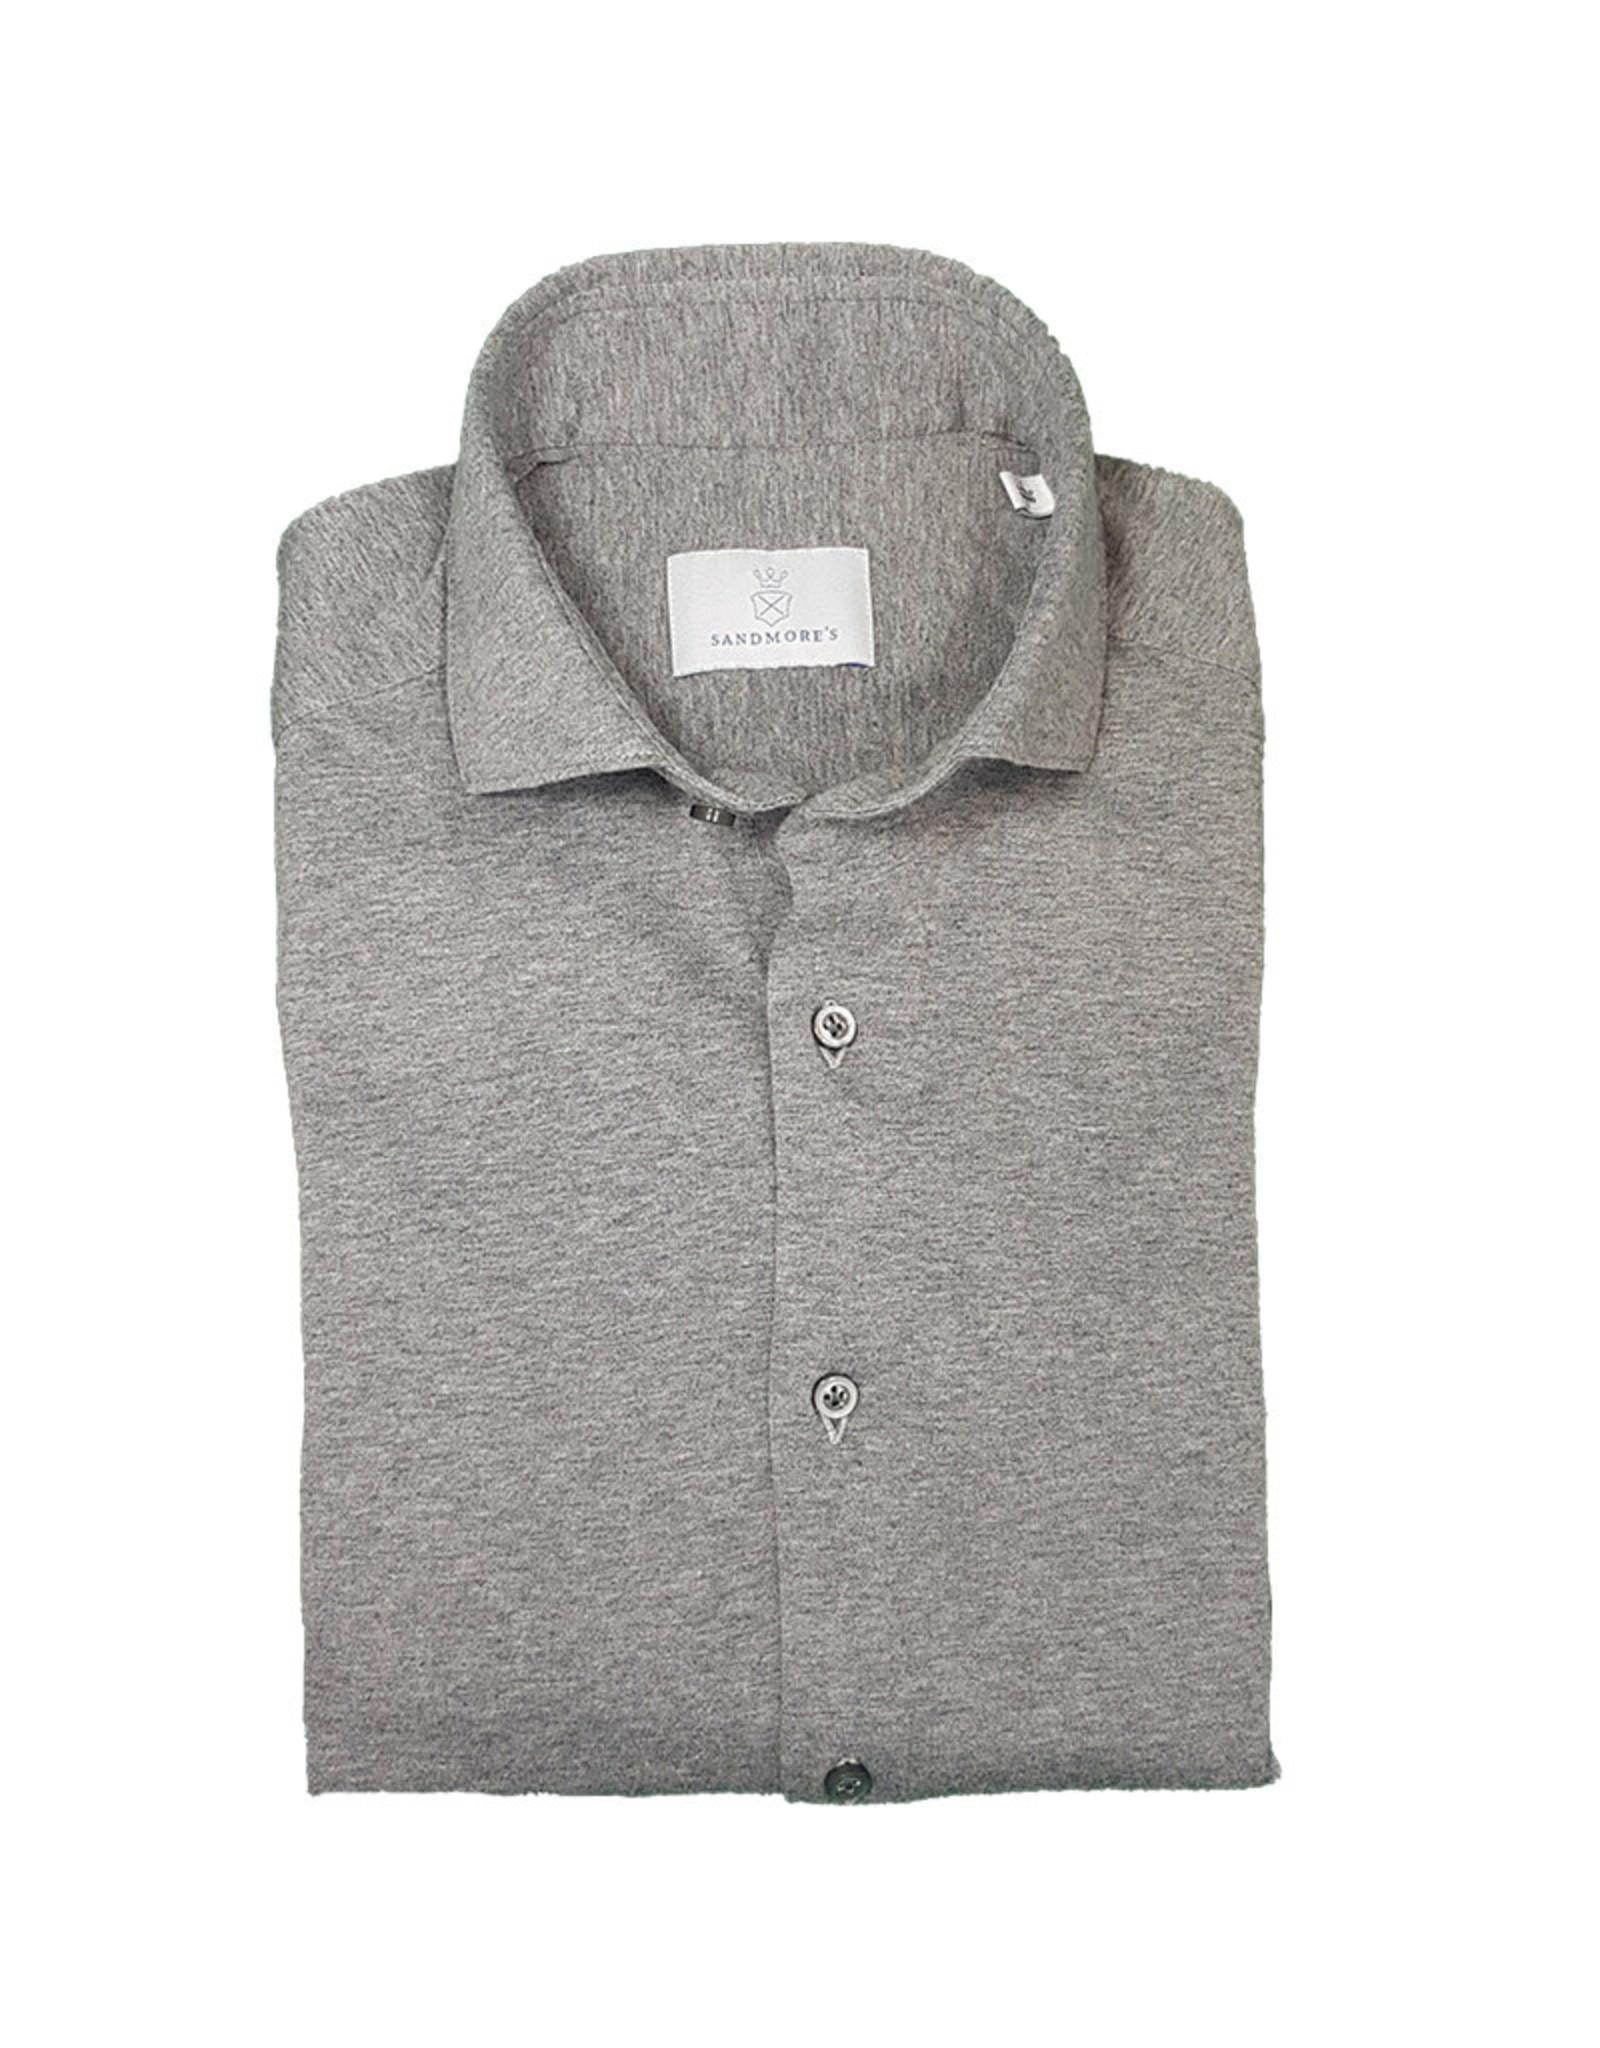 Ghirardelli Sandmore's hemd jersey grijs Semi-slim J553